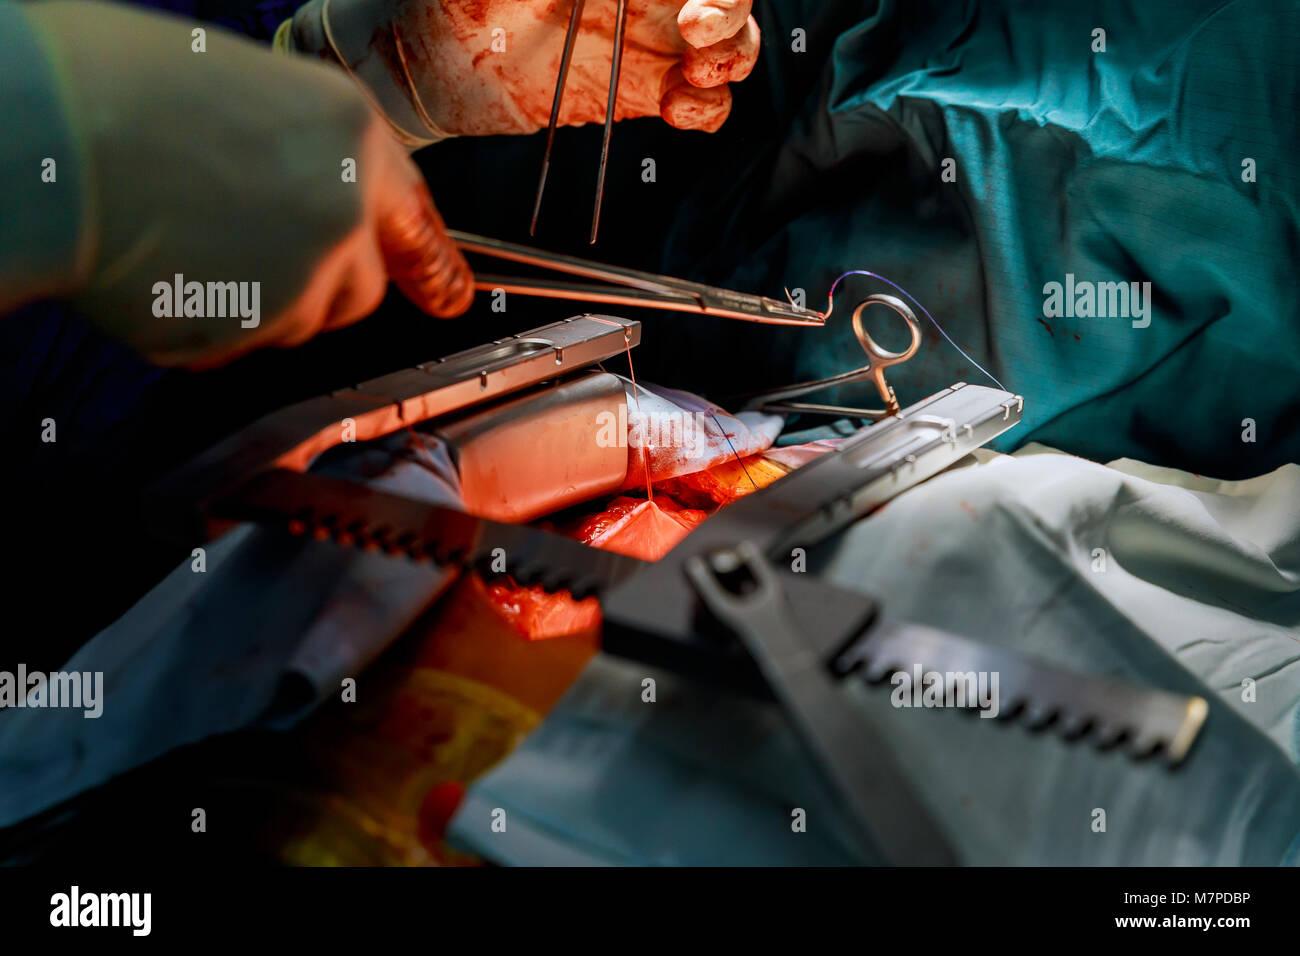 Tricuspid Valve Stockfotos & Tricuspid Valve Bilder - Alamy